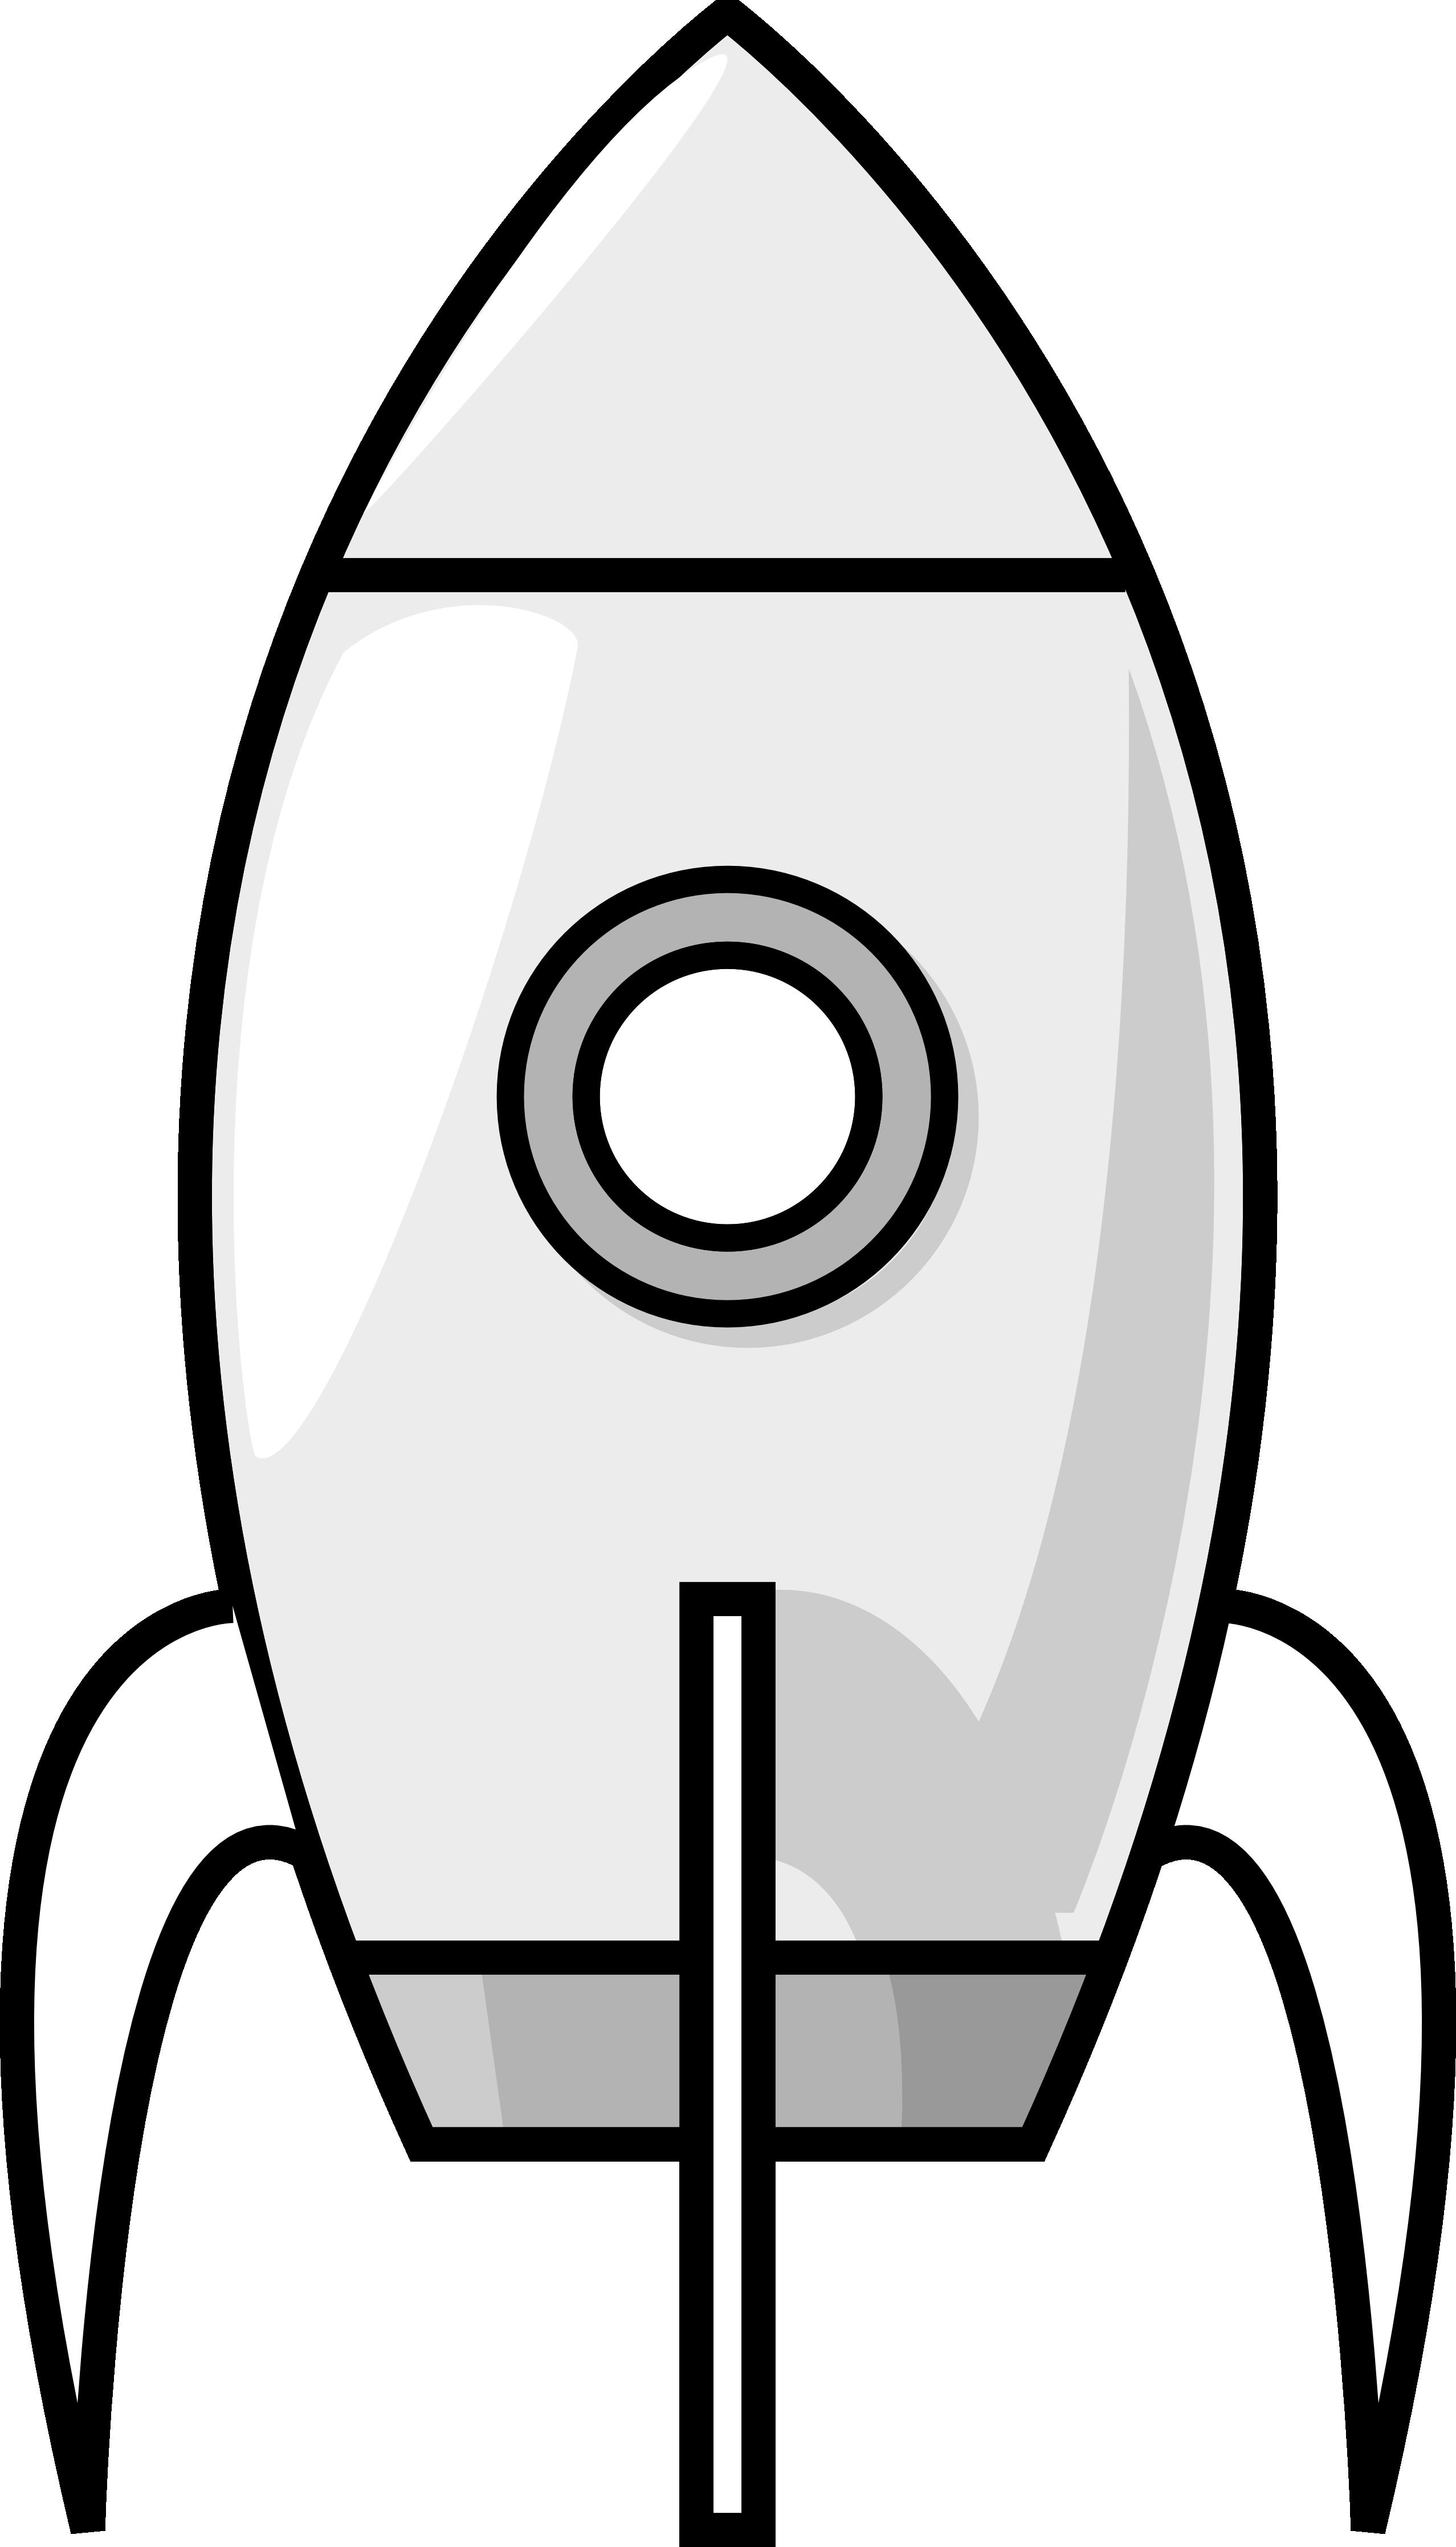 Cartoon rocketship image group. Spaceship clipart crashed spaceship